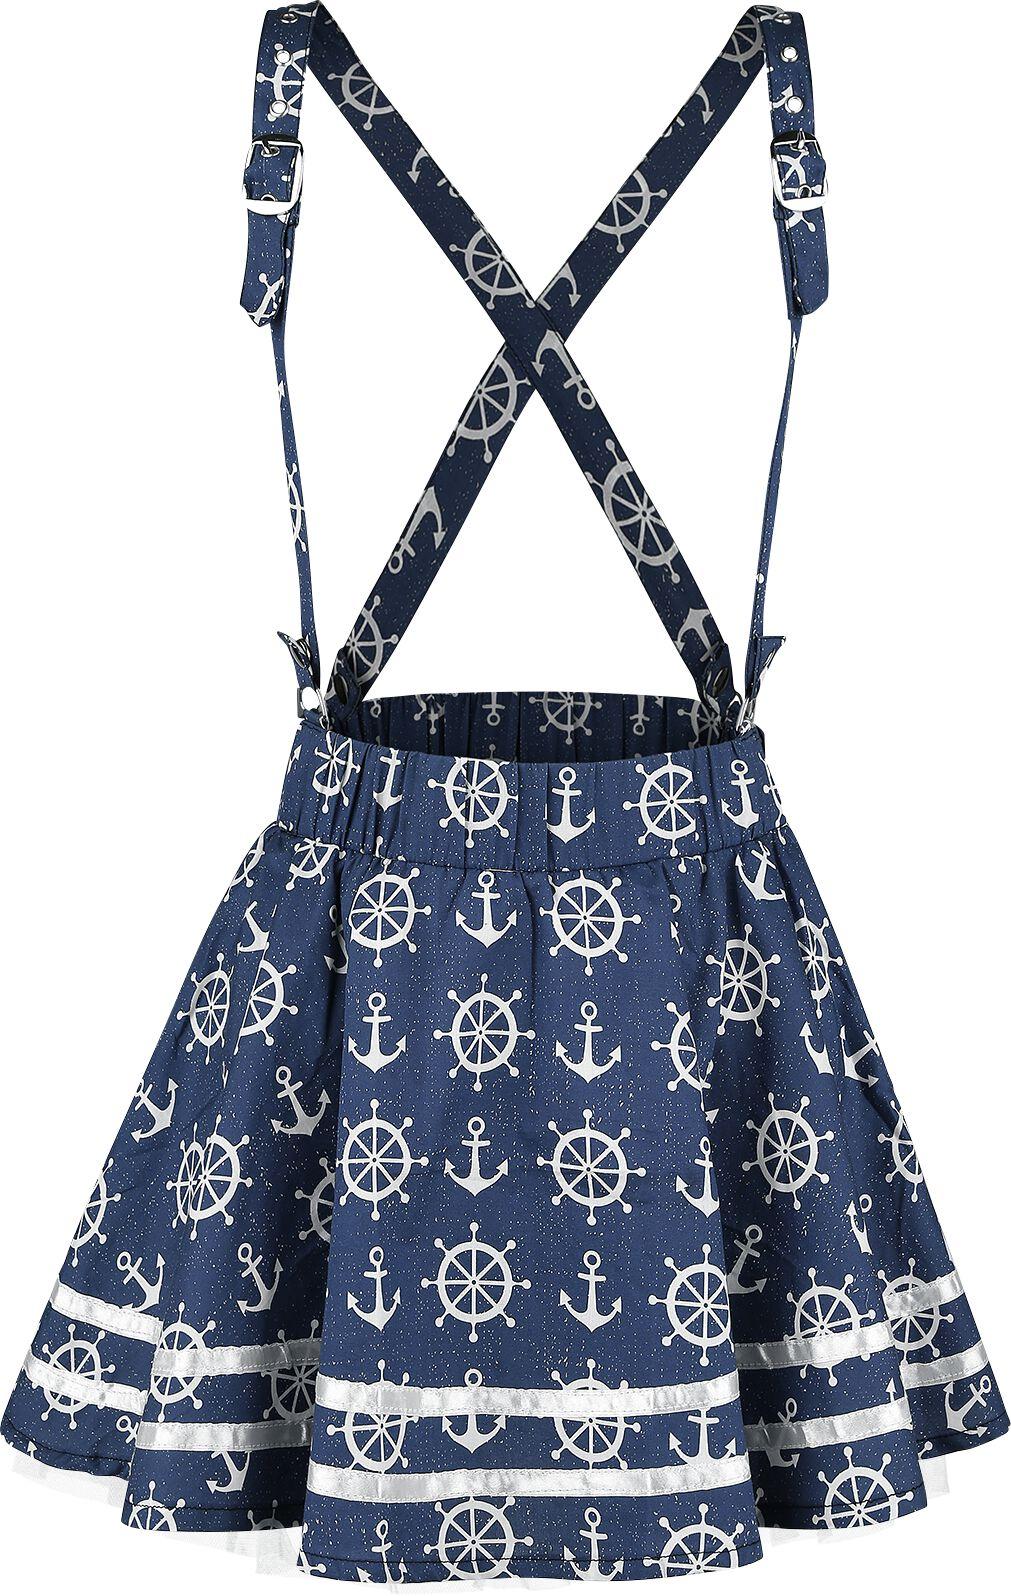 Marki - Spódnice - Spódnica Mini Rockabella Alexis Skirt Spódnica Mini niebieski - 346297